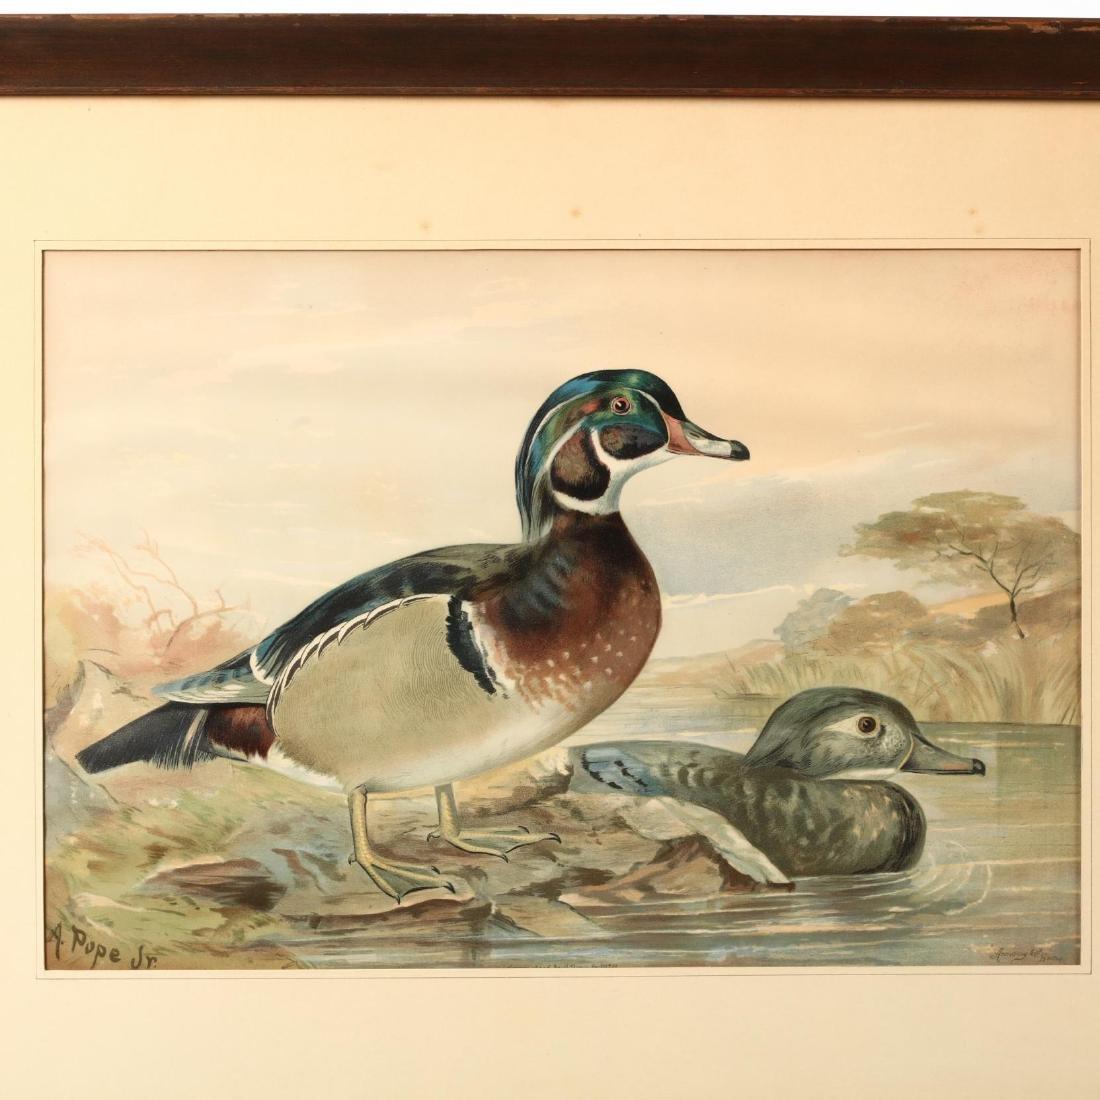 Alexander Pope Jr. (American, 1849-1924), Four Works - 5